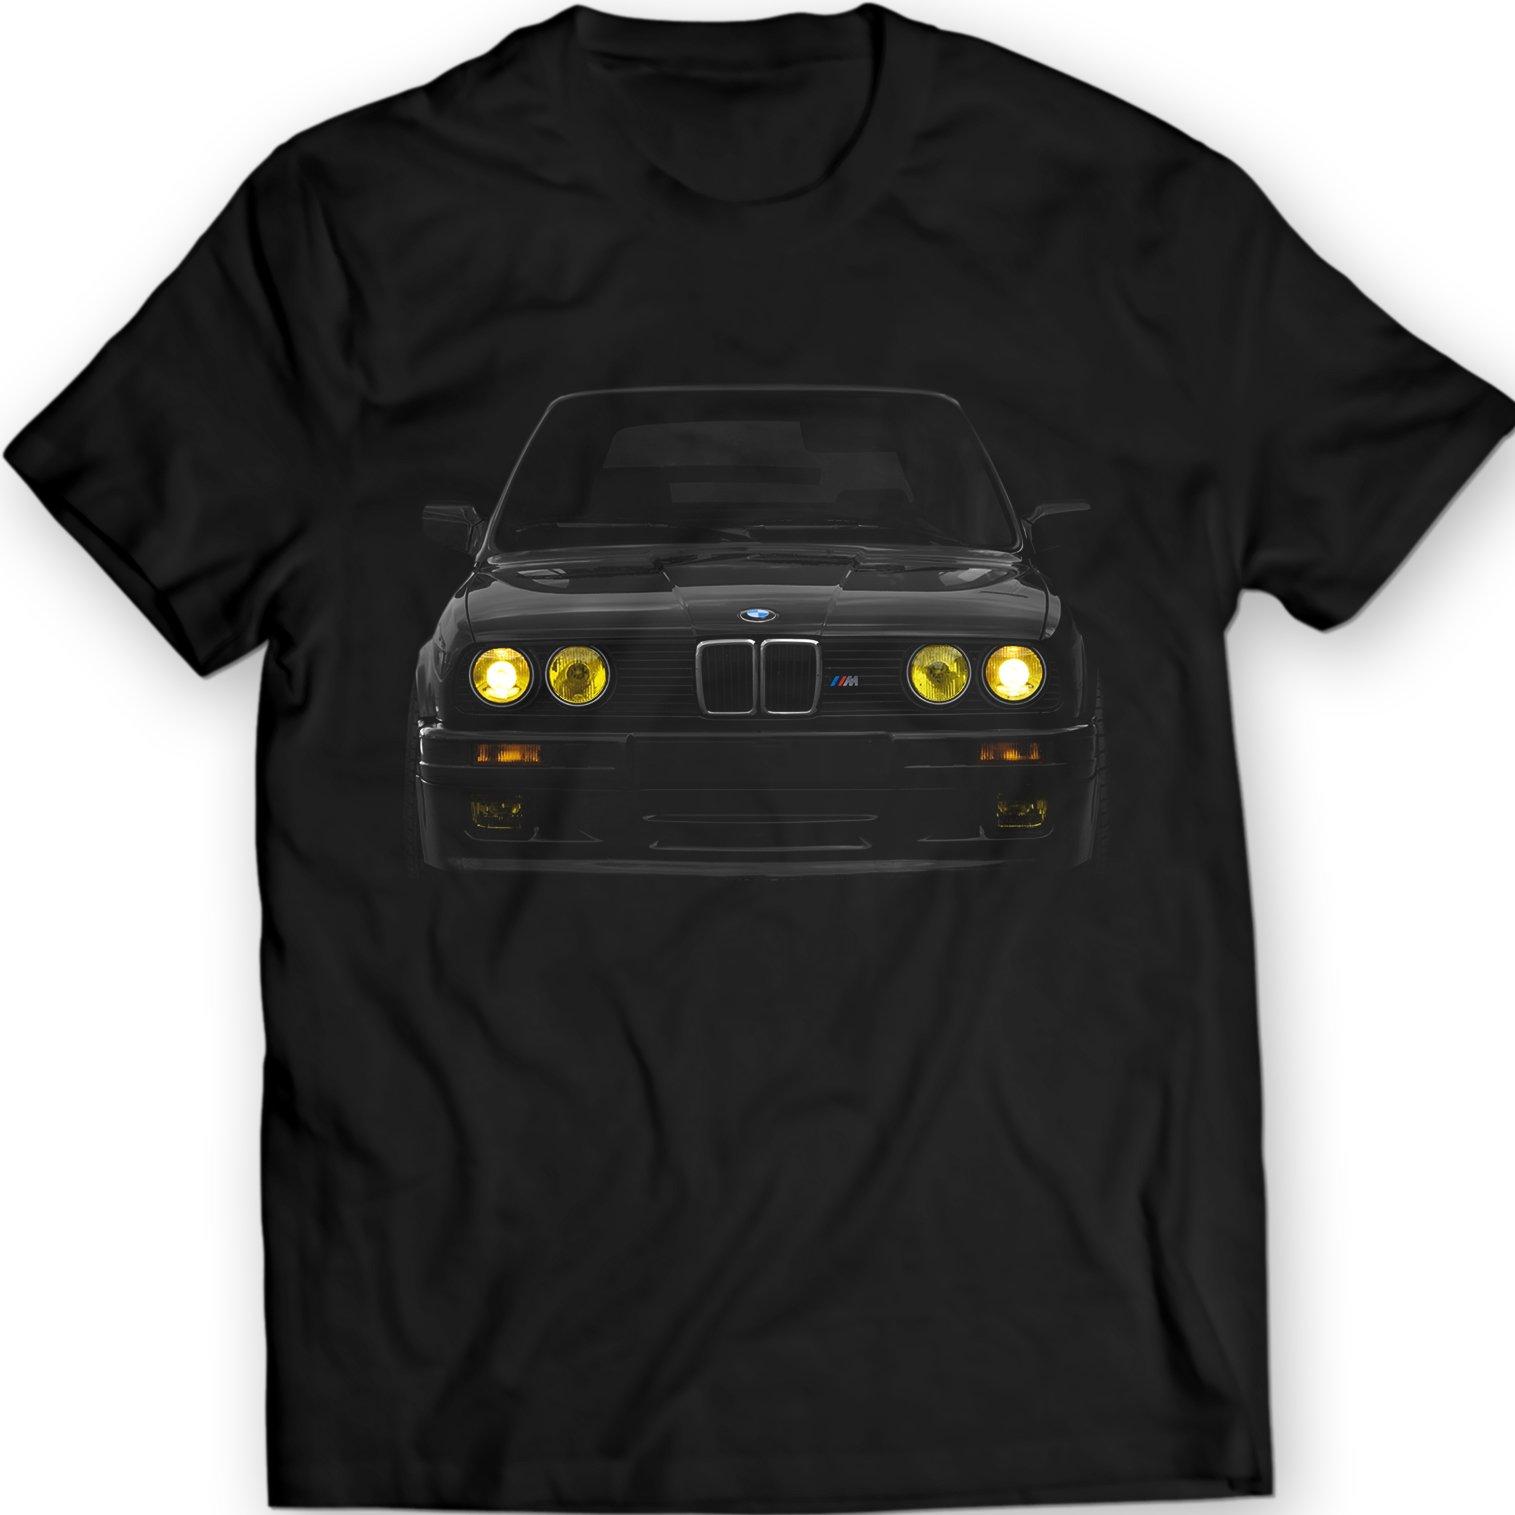 2019 New Cool Tee Shirt Germany Car E30 Yellow Headlights T-Shirt Power Bimmer M5 M3 100% Cotton Holiday Gift Birthday T-shirt Футболка